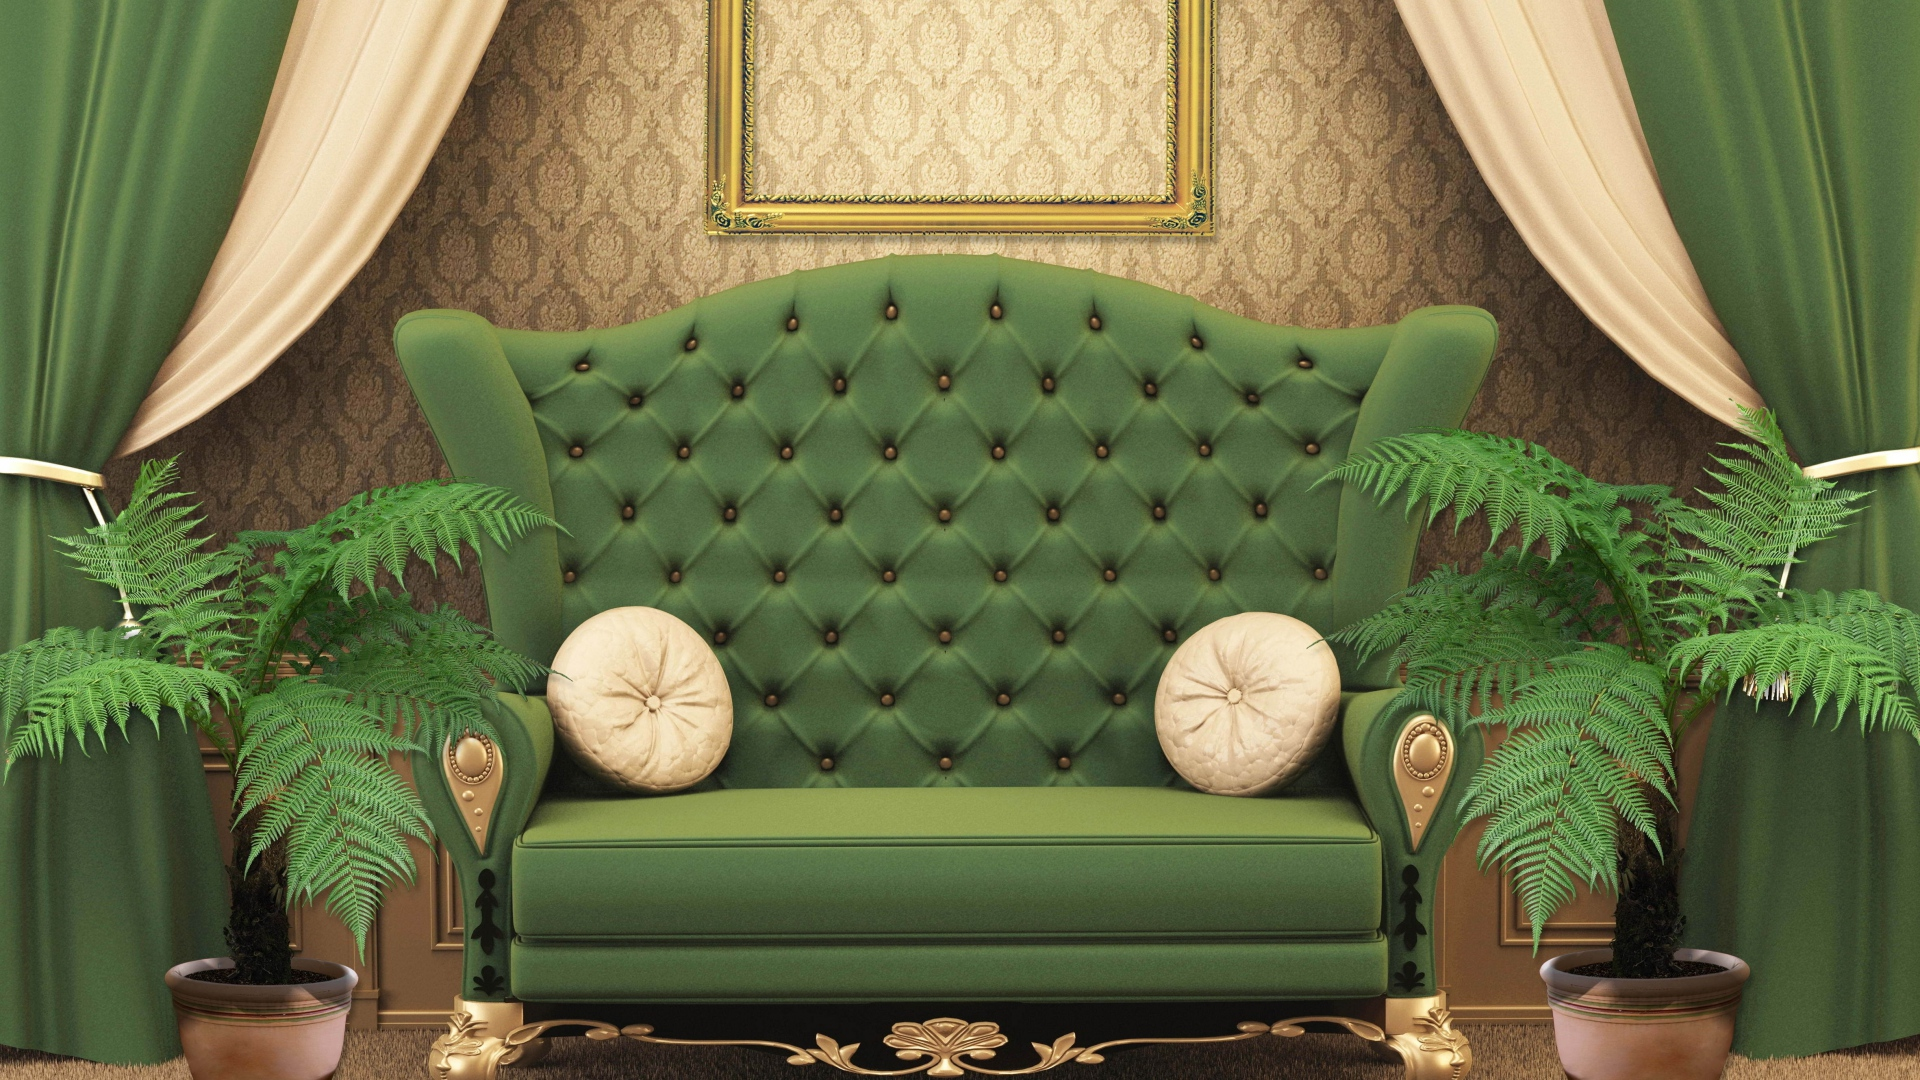 Download Wallpaper 1920x1080 Chair Green Room Full HD